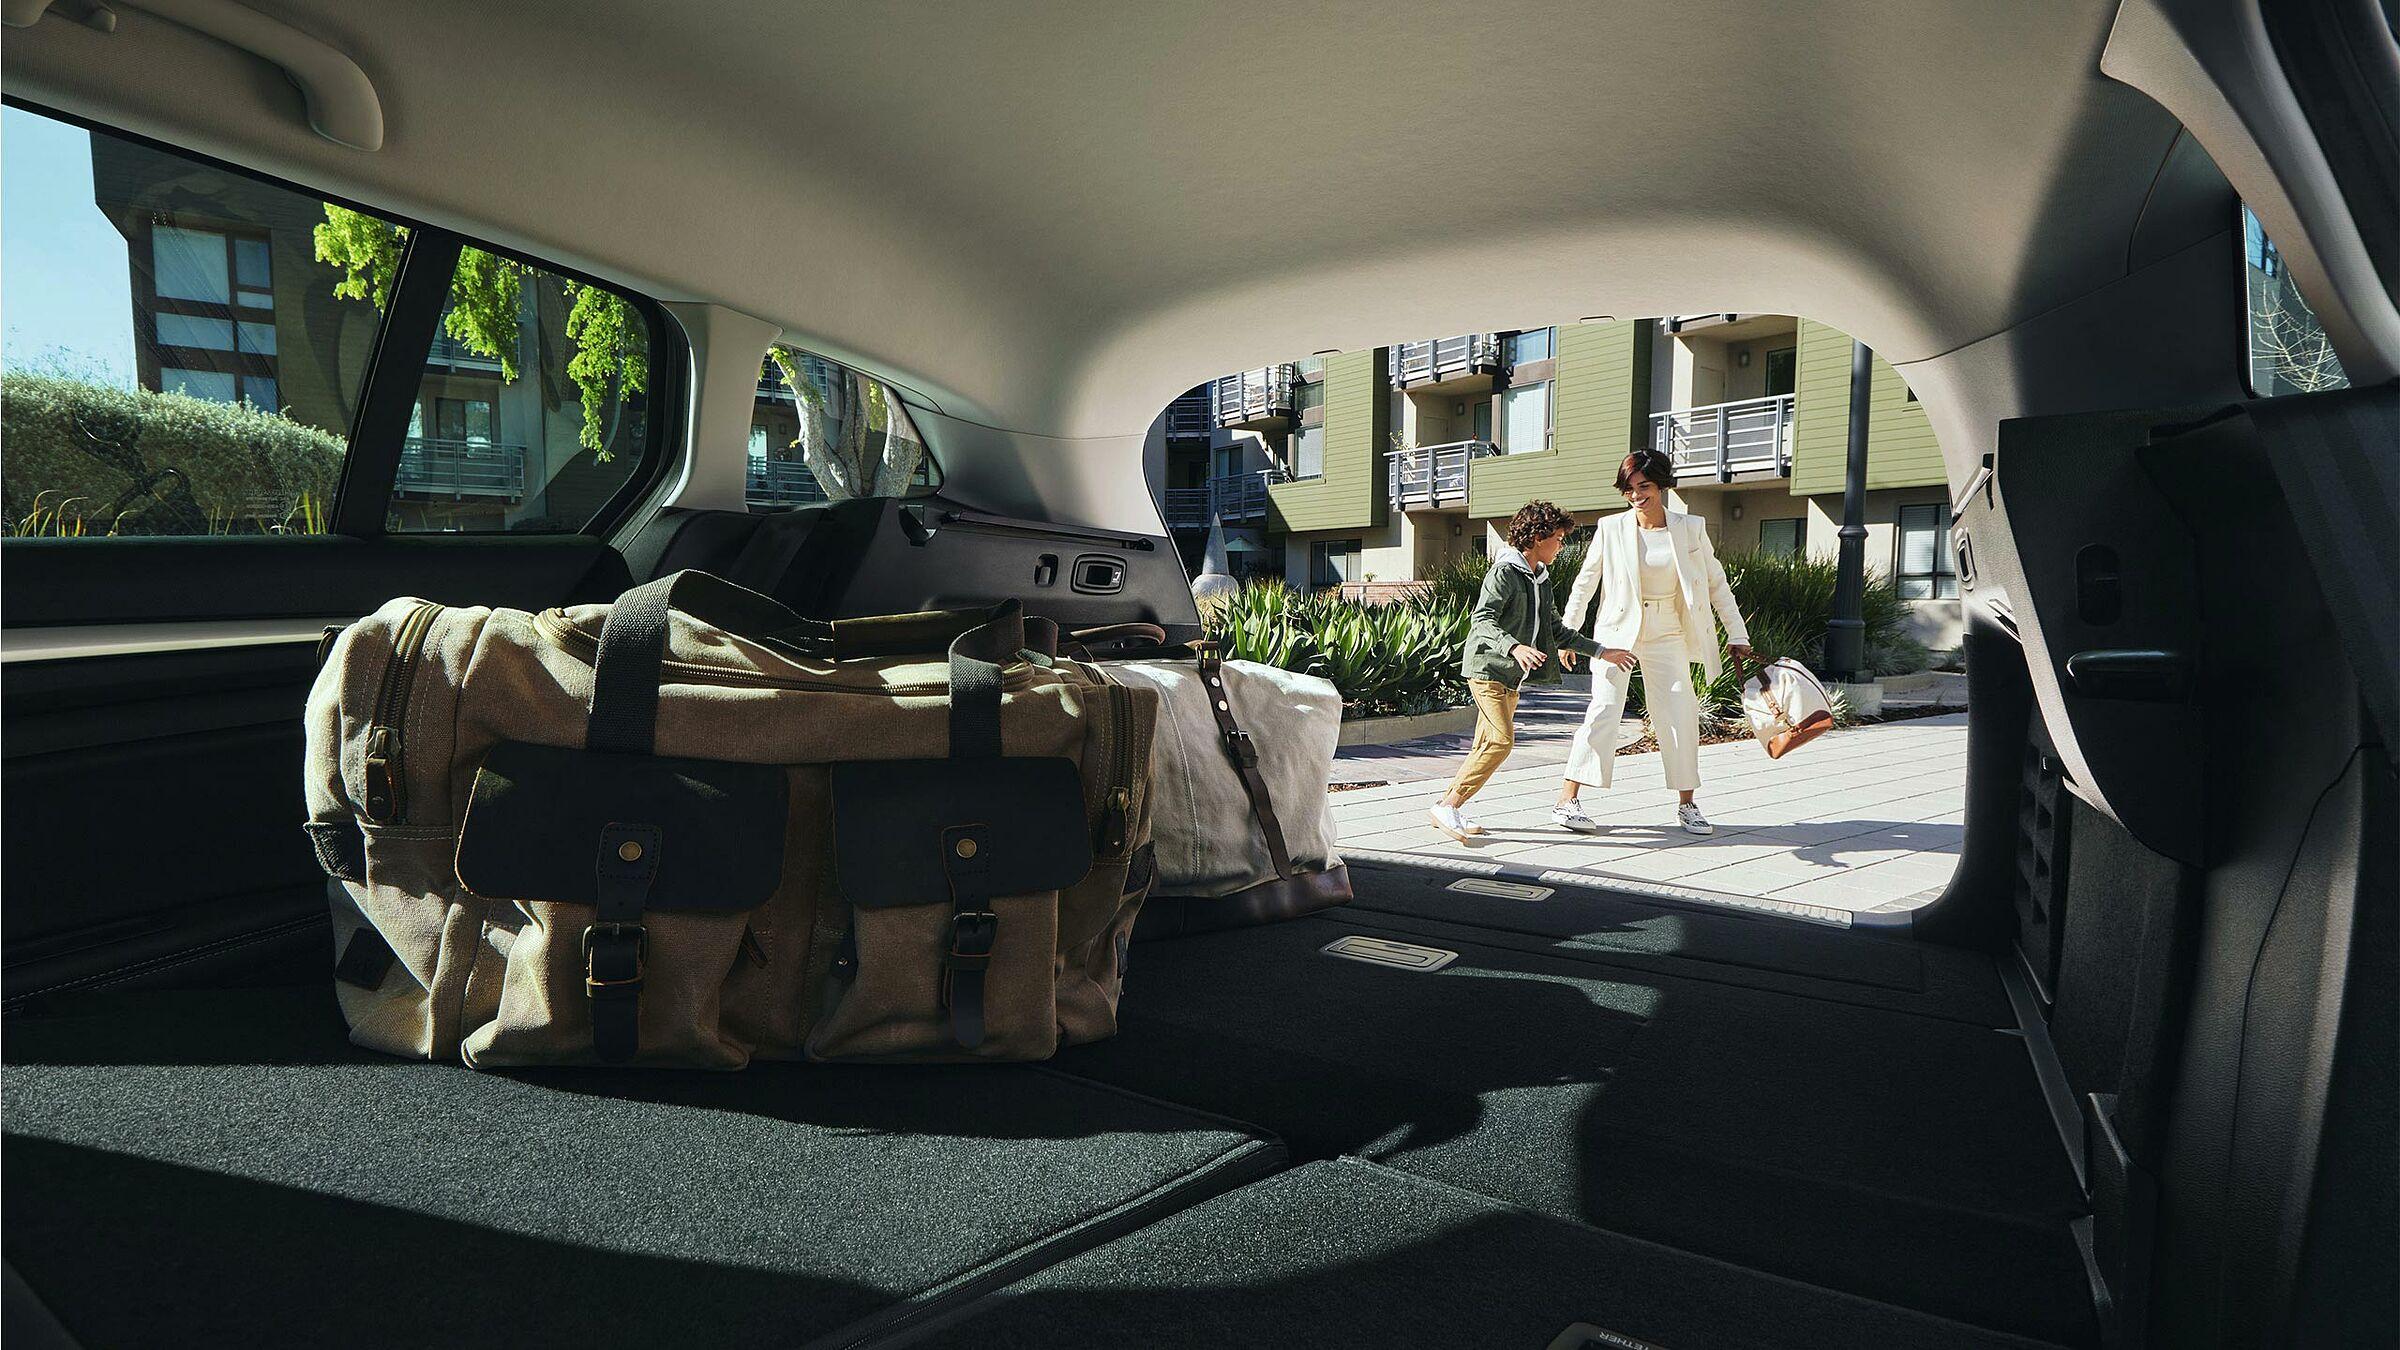 Renault Megane Grandtour Autozentren P&A - Preckel